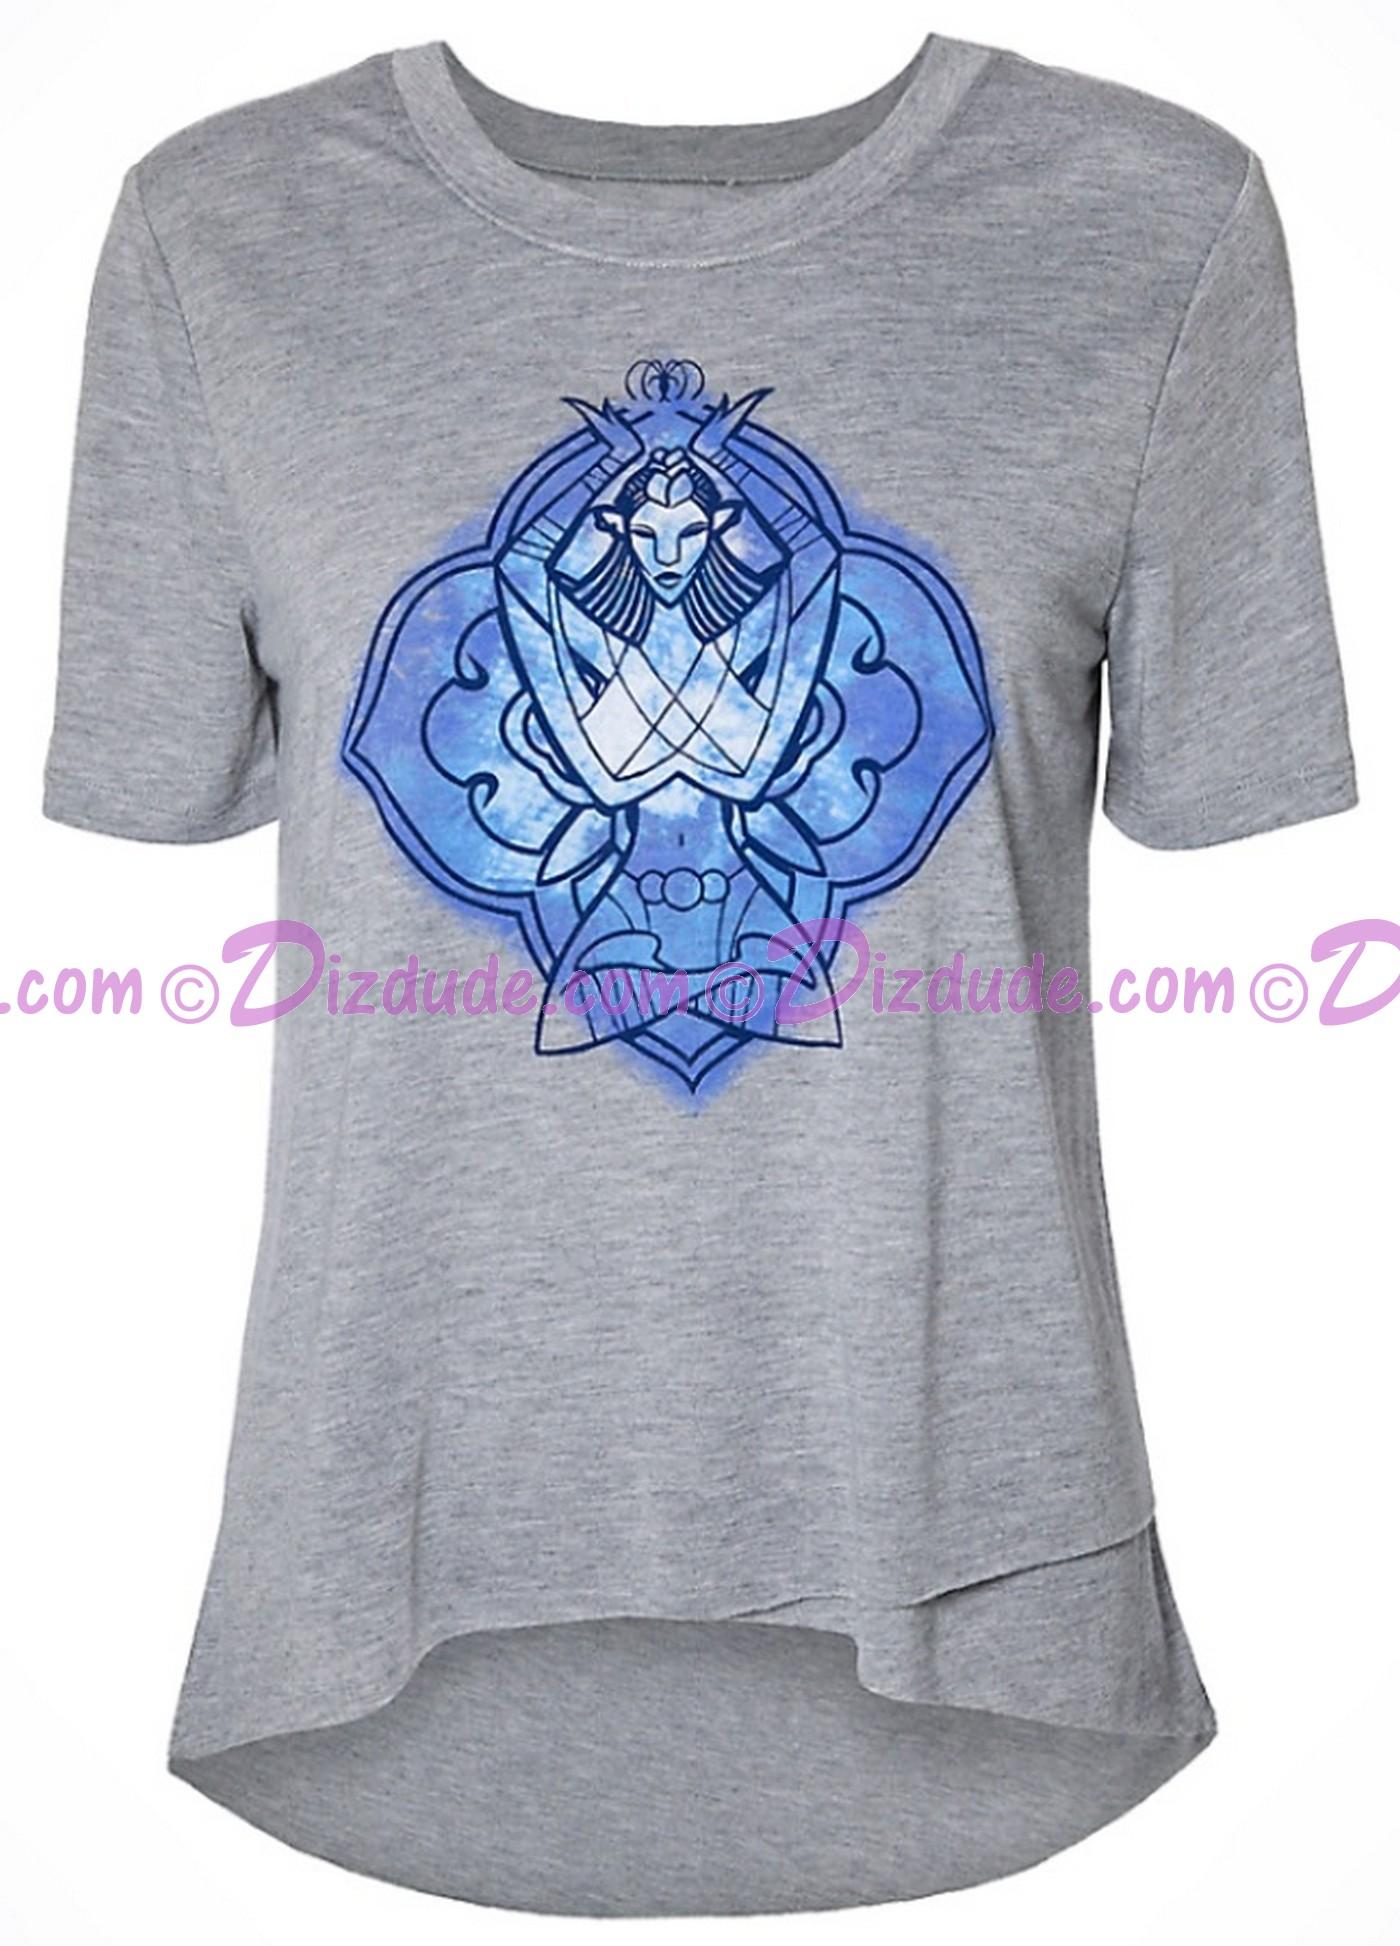 Avatar Shaman Hi-Lo Adult T-shirt (Tee, Tshirt or T shirt) - Disney Pandora – The World of Avatar